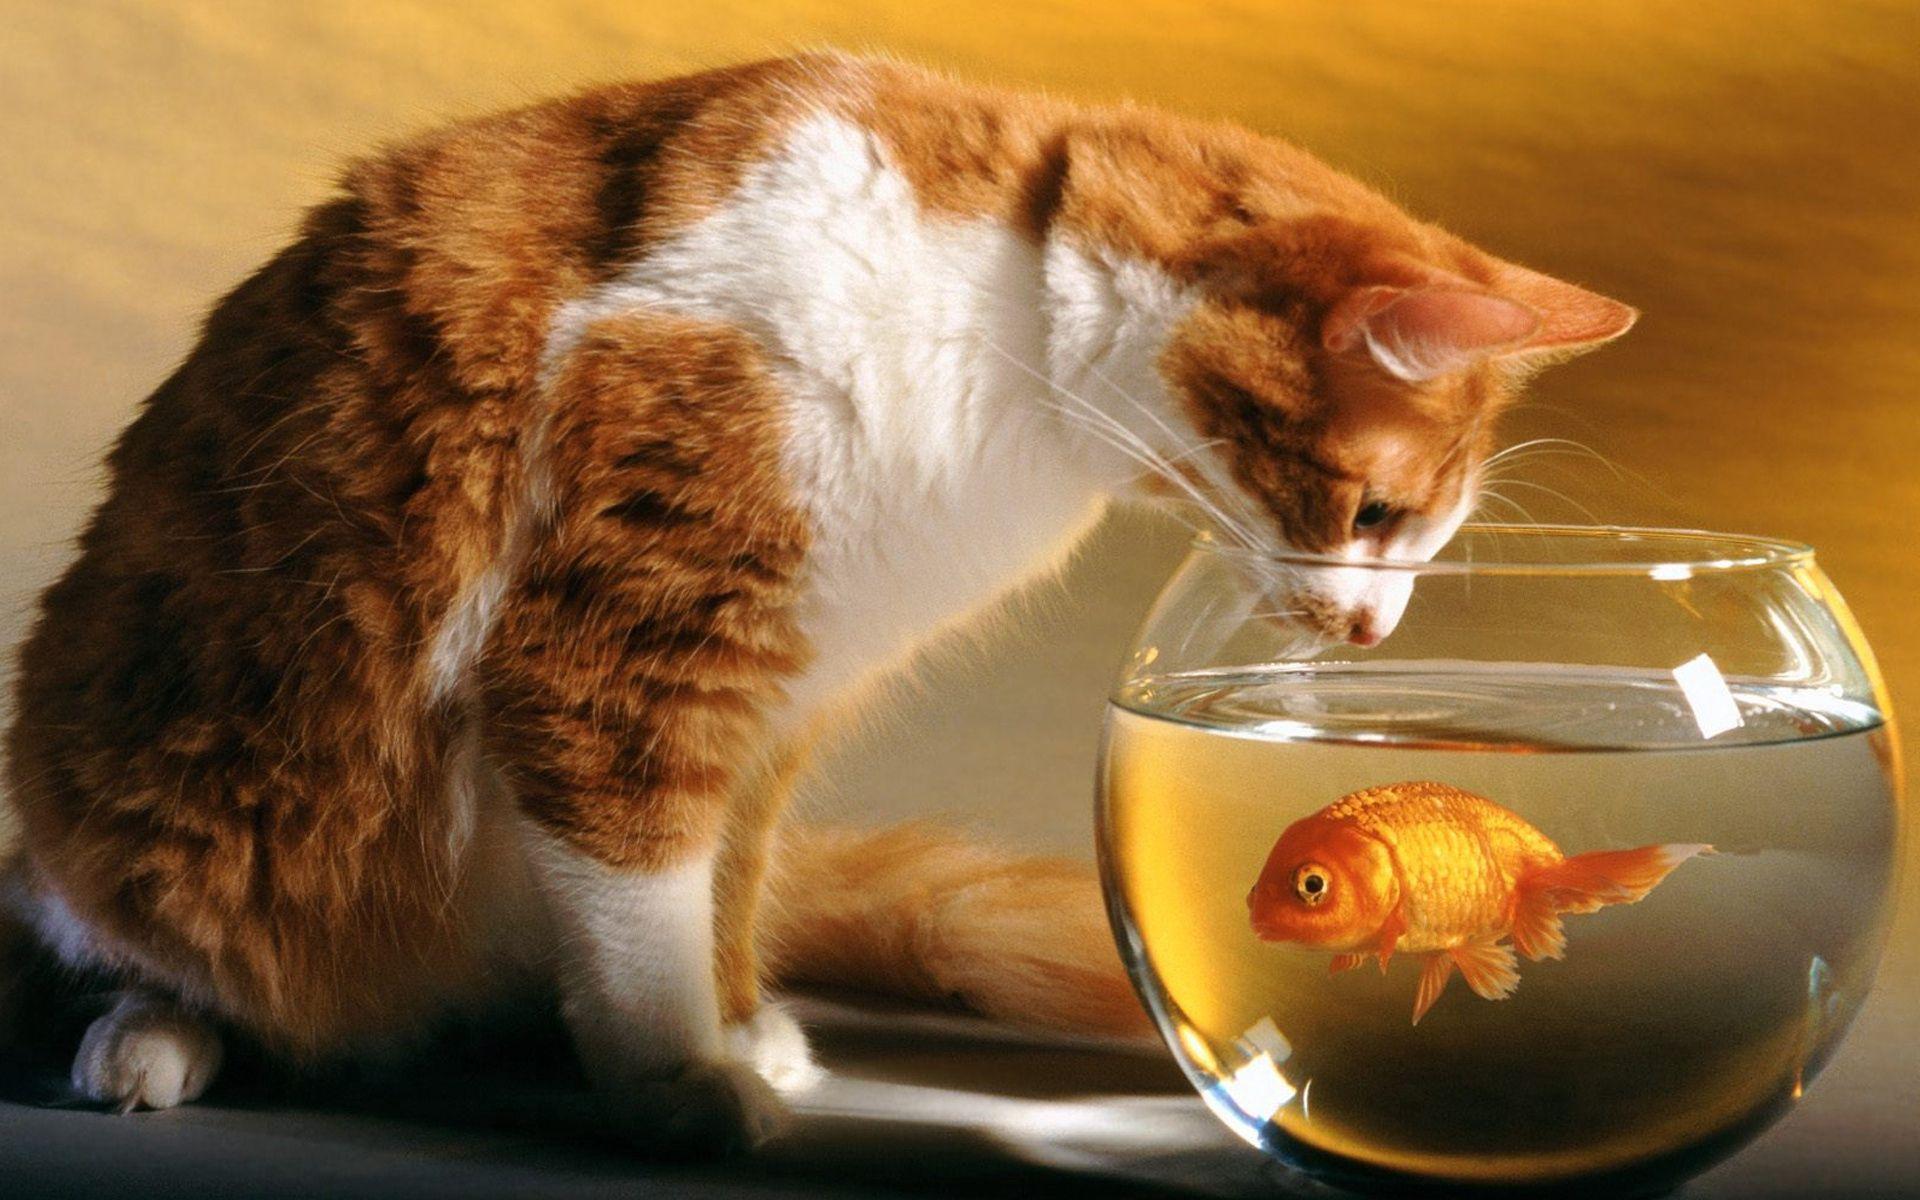 85712 Screensavers and Wallpapers Aquarium for phone. Download Animals, Cat, Hunting, Hunt, Aquarium, Curiosity pictures for free